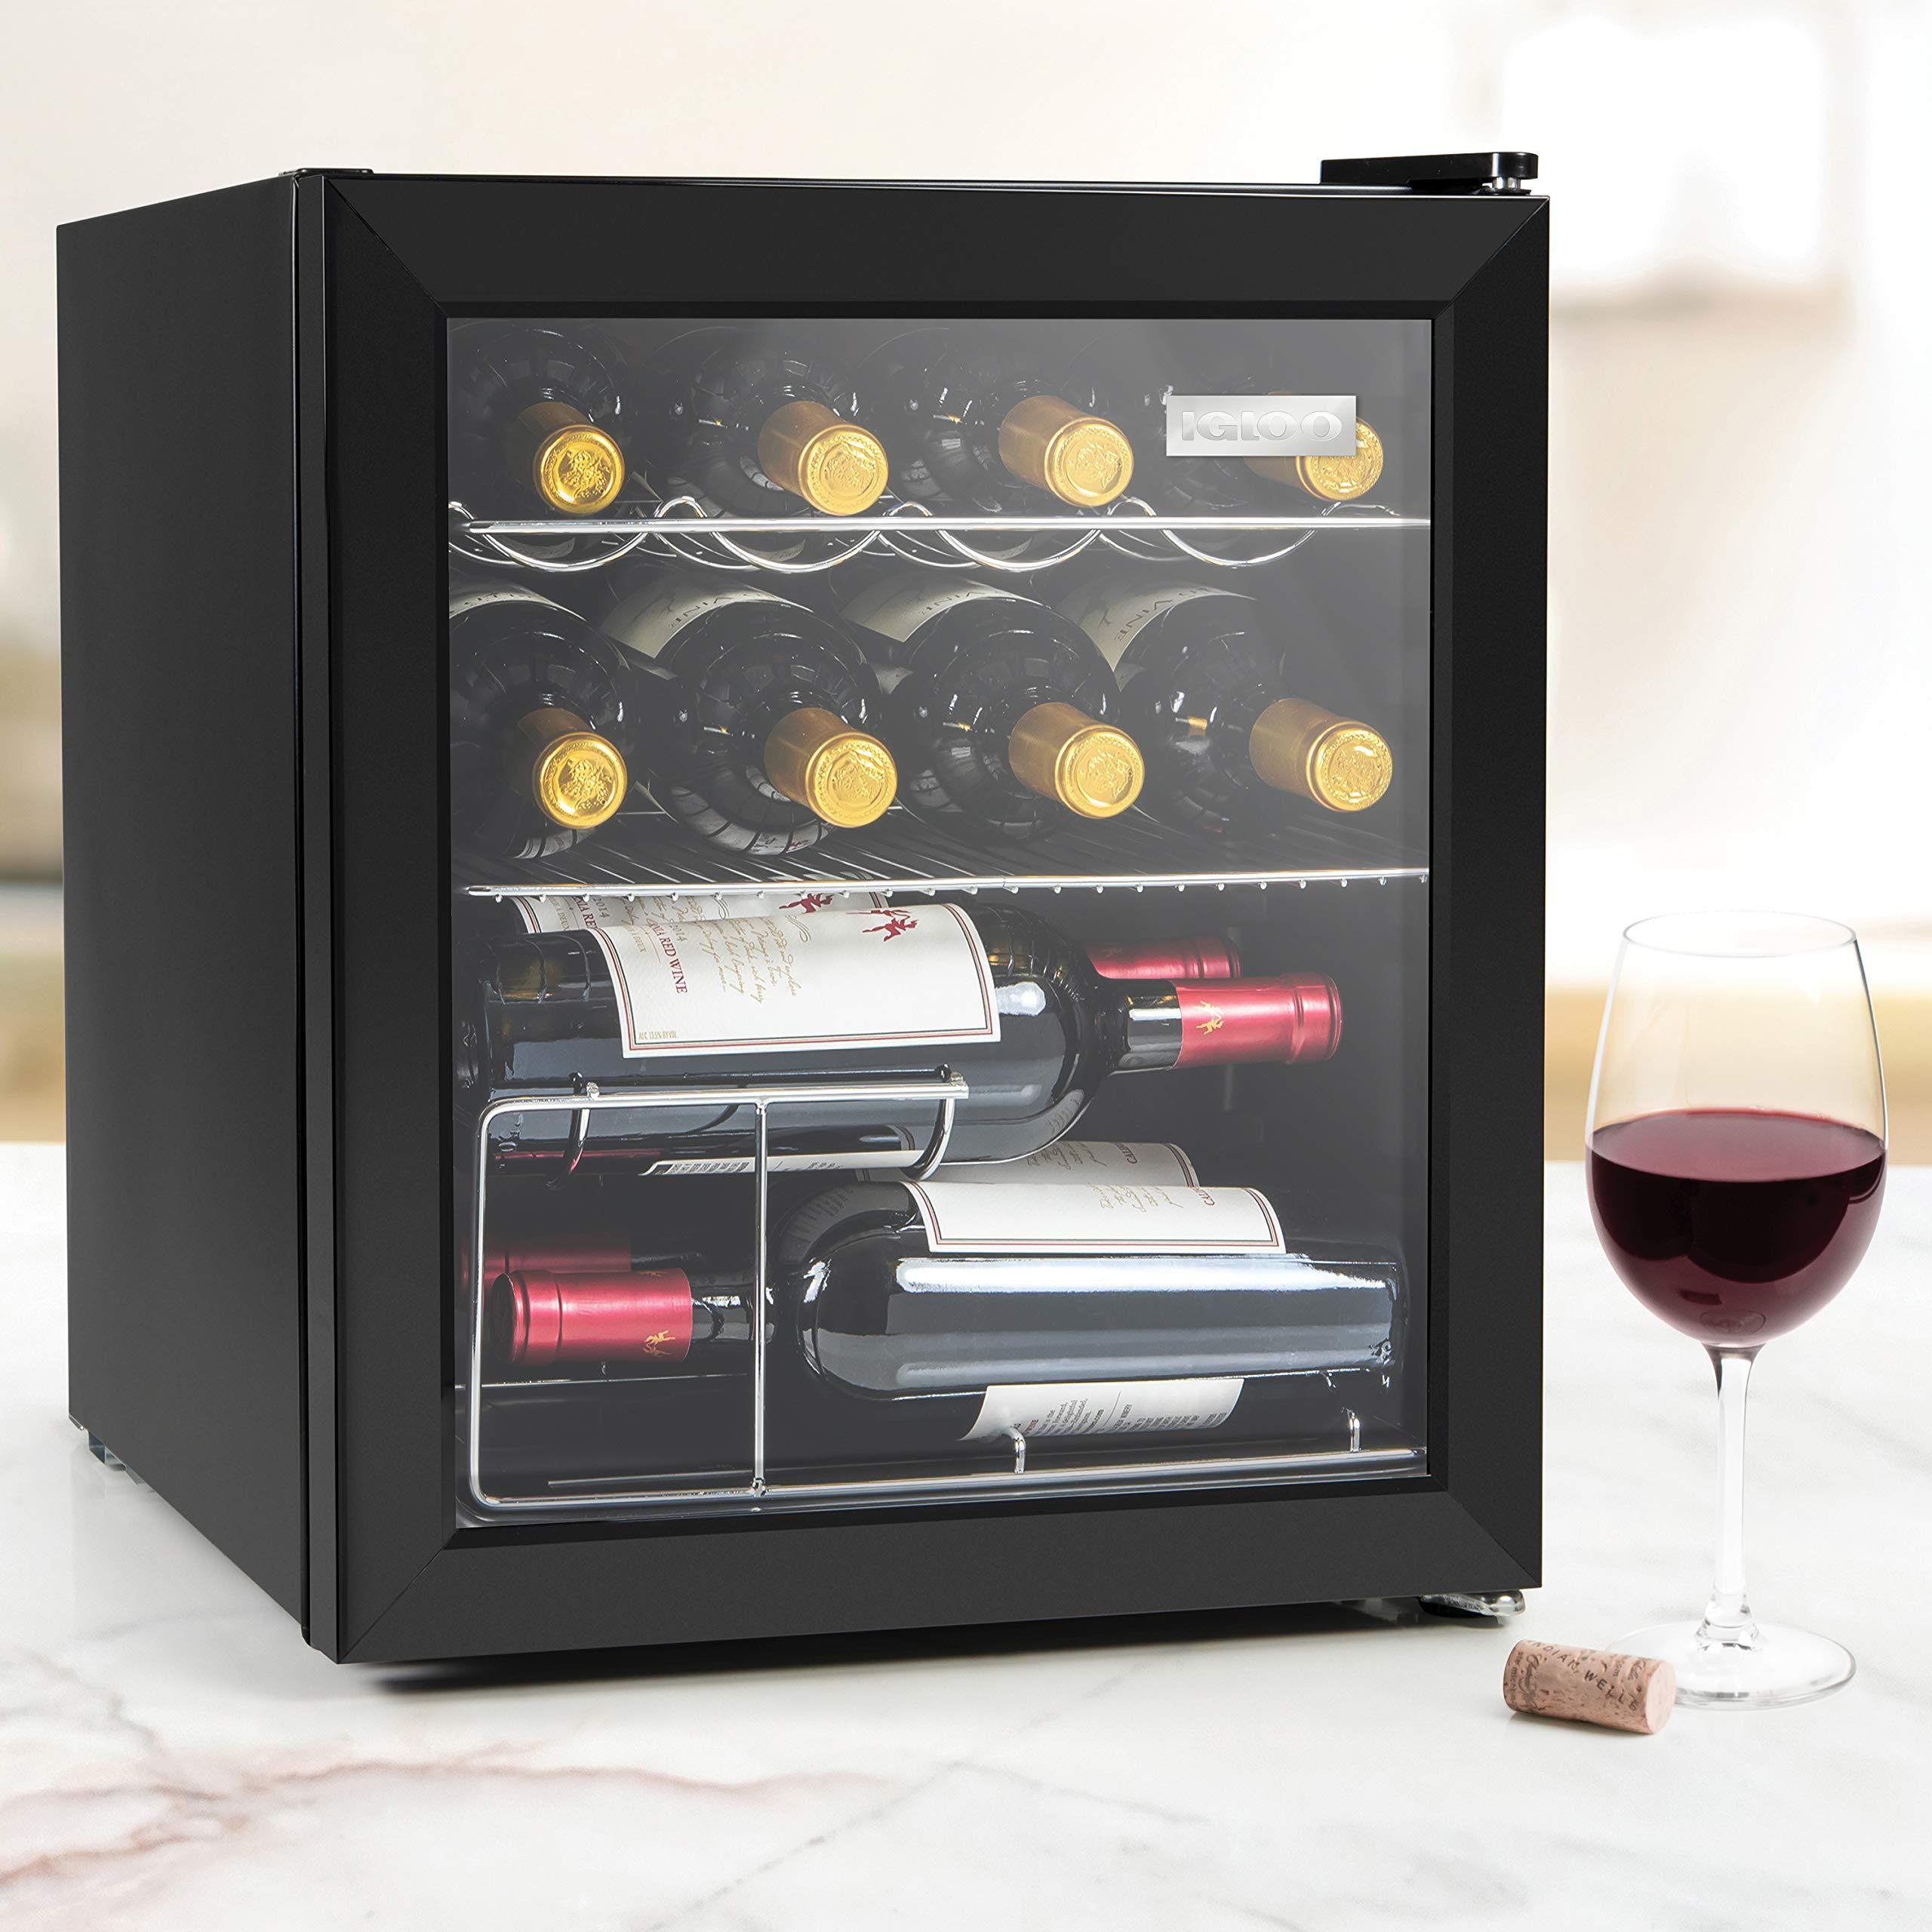 Igloo IBC16BK 15-Wine Bottle or 60-Can Glass Door Beverage Center Refrigerator and Cooler, Black